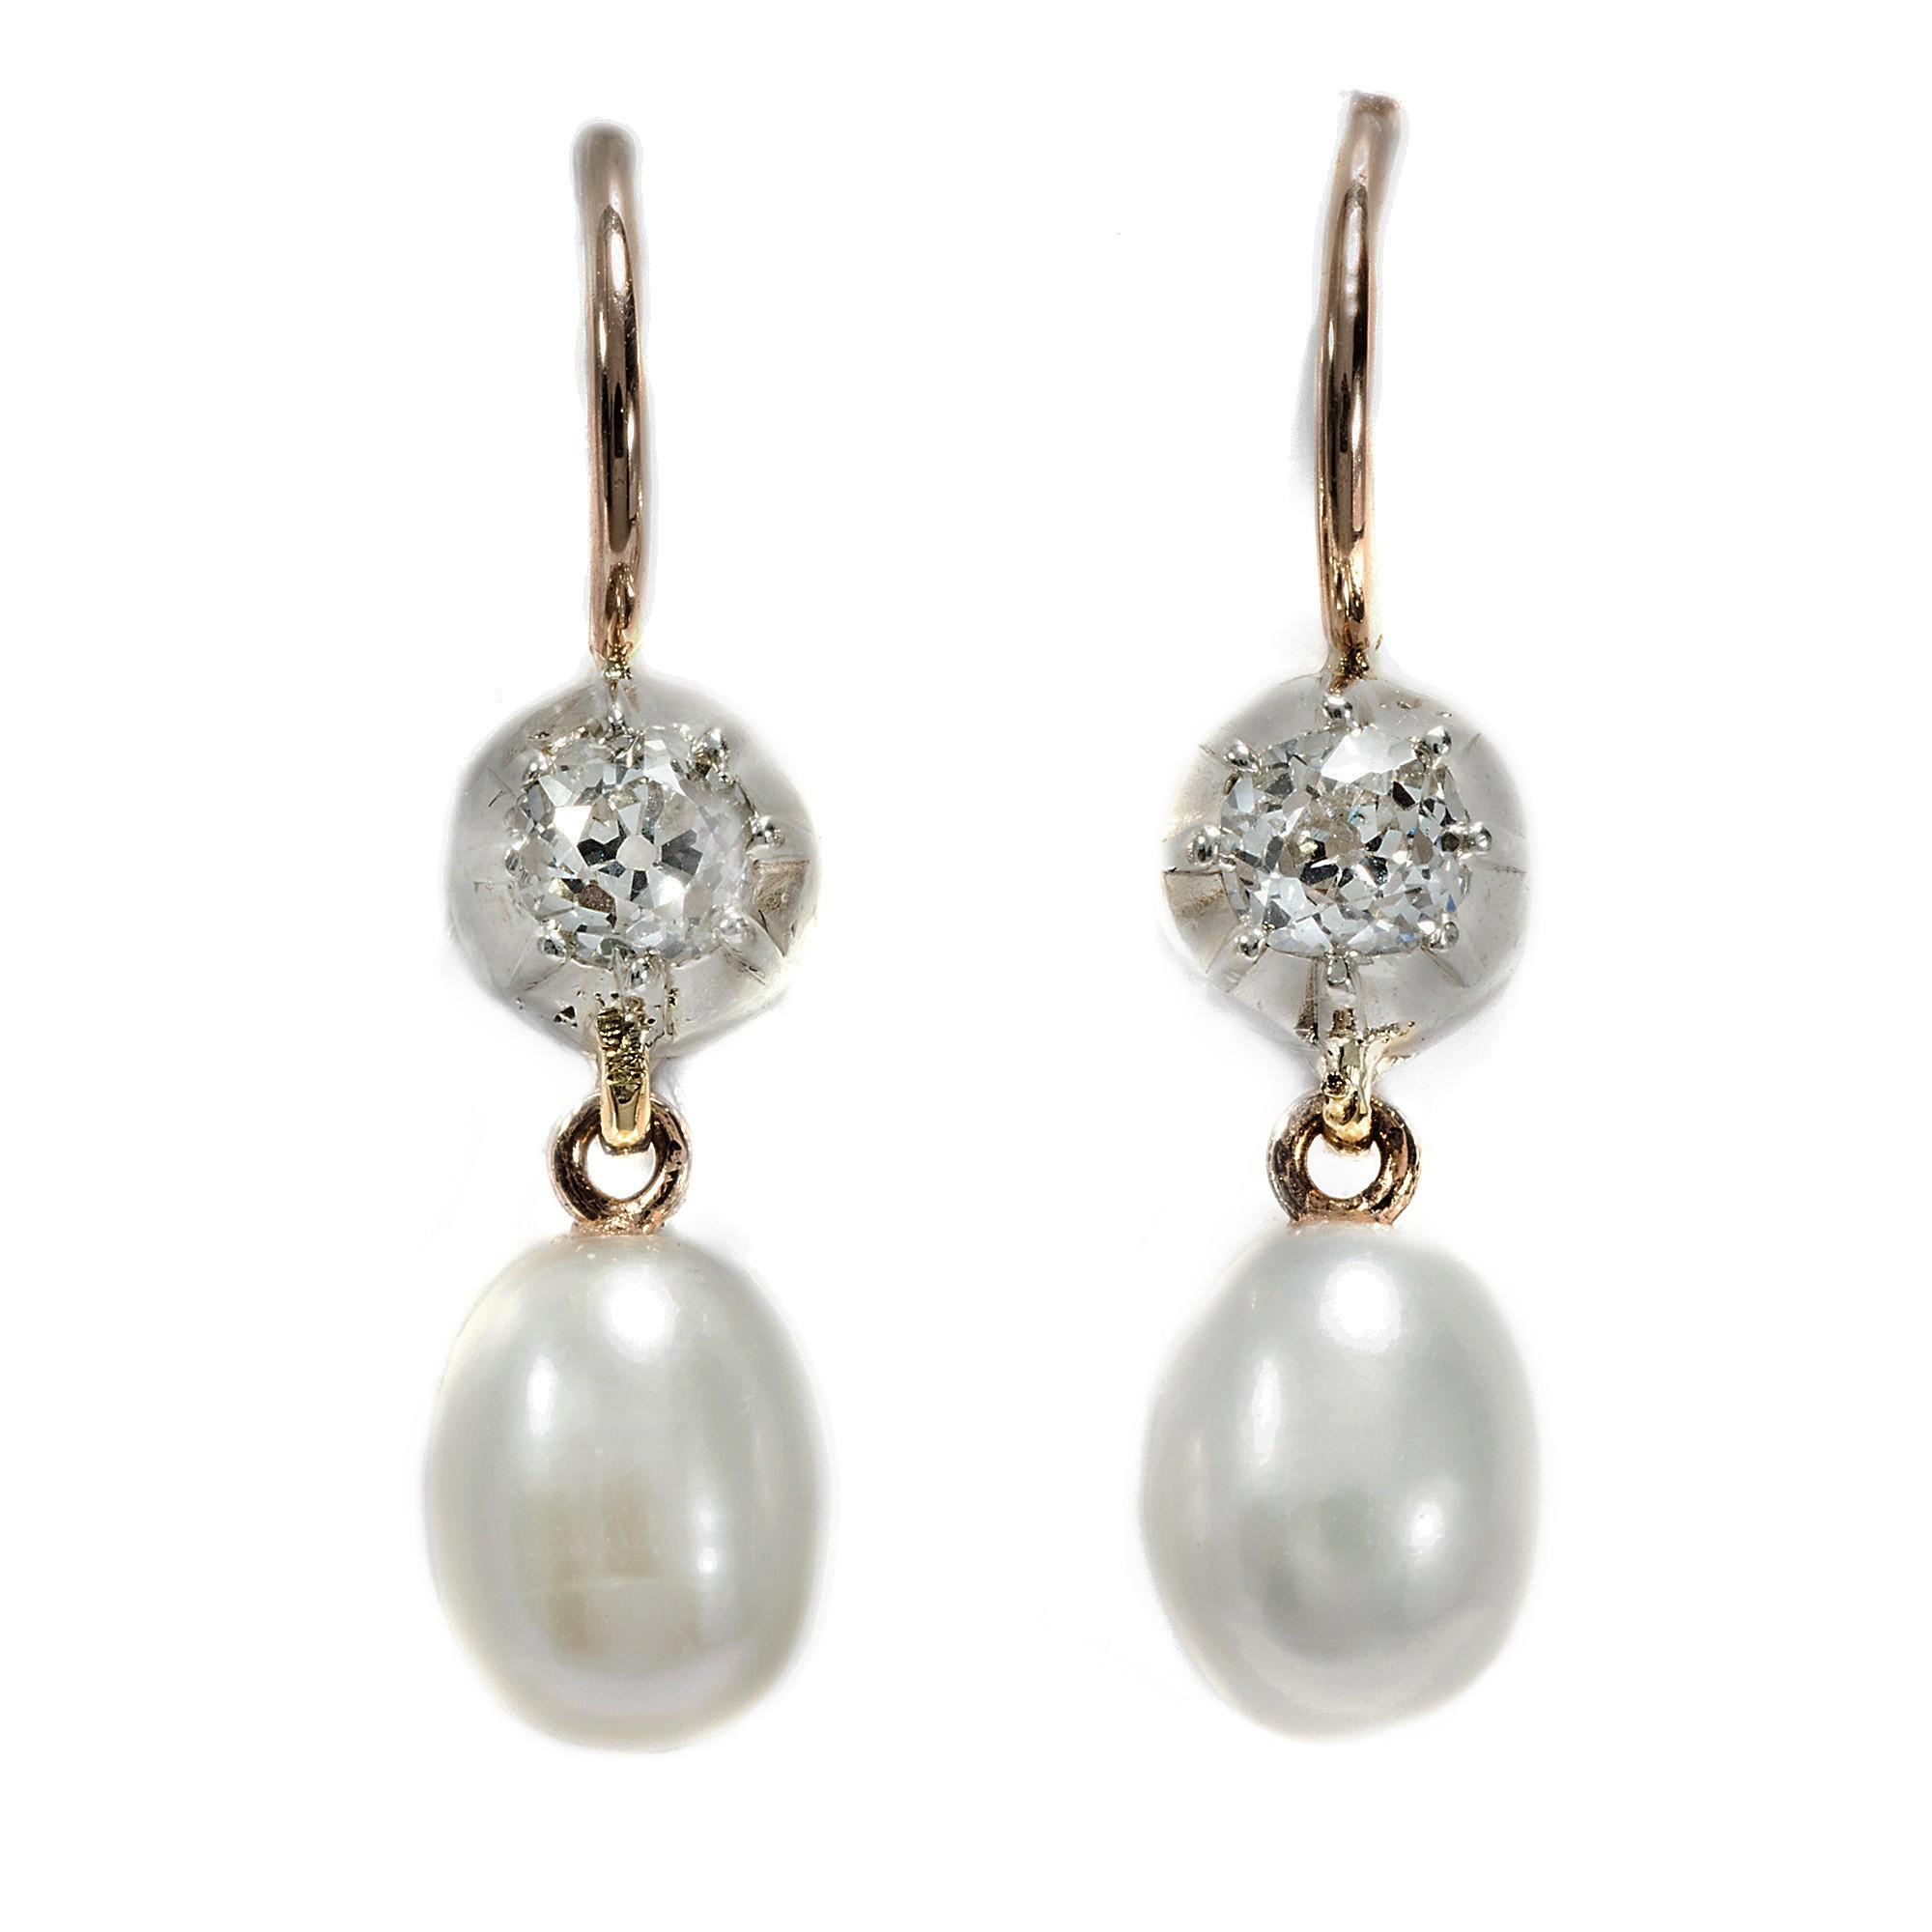 edle tropfen ohrringe perlen altschliff diamanten in silber gold earrings ebay. Black Bedroom Furniture Sets. Home Design Ideas